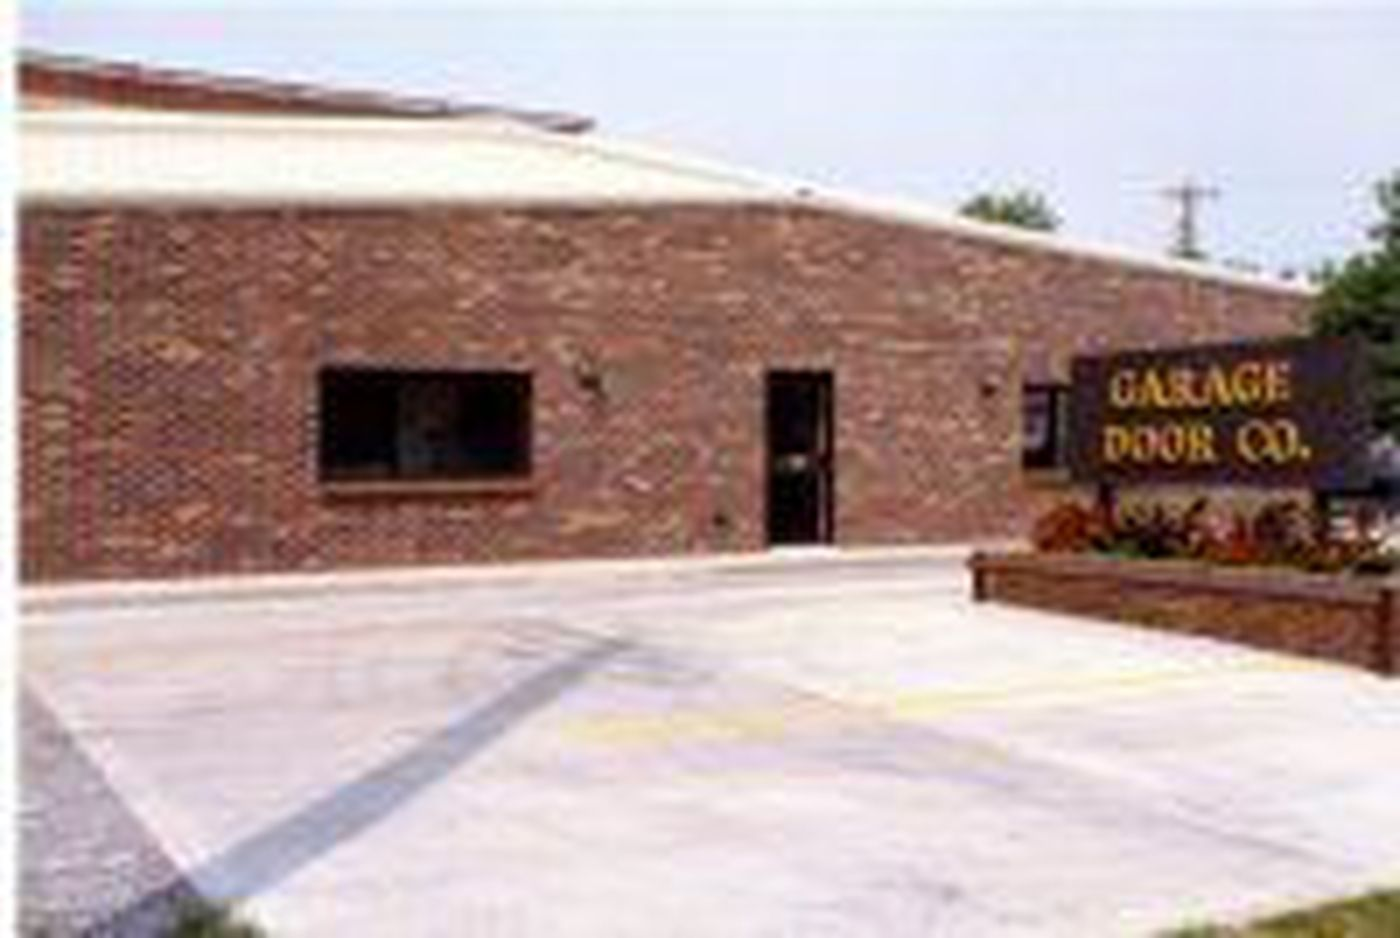 Garage Door Company Of Sikeston